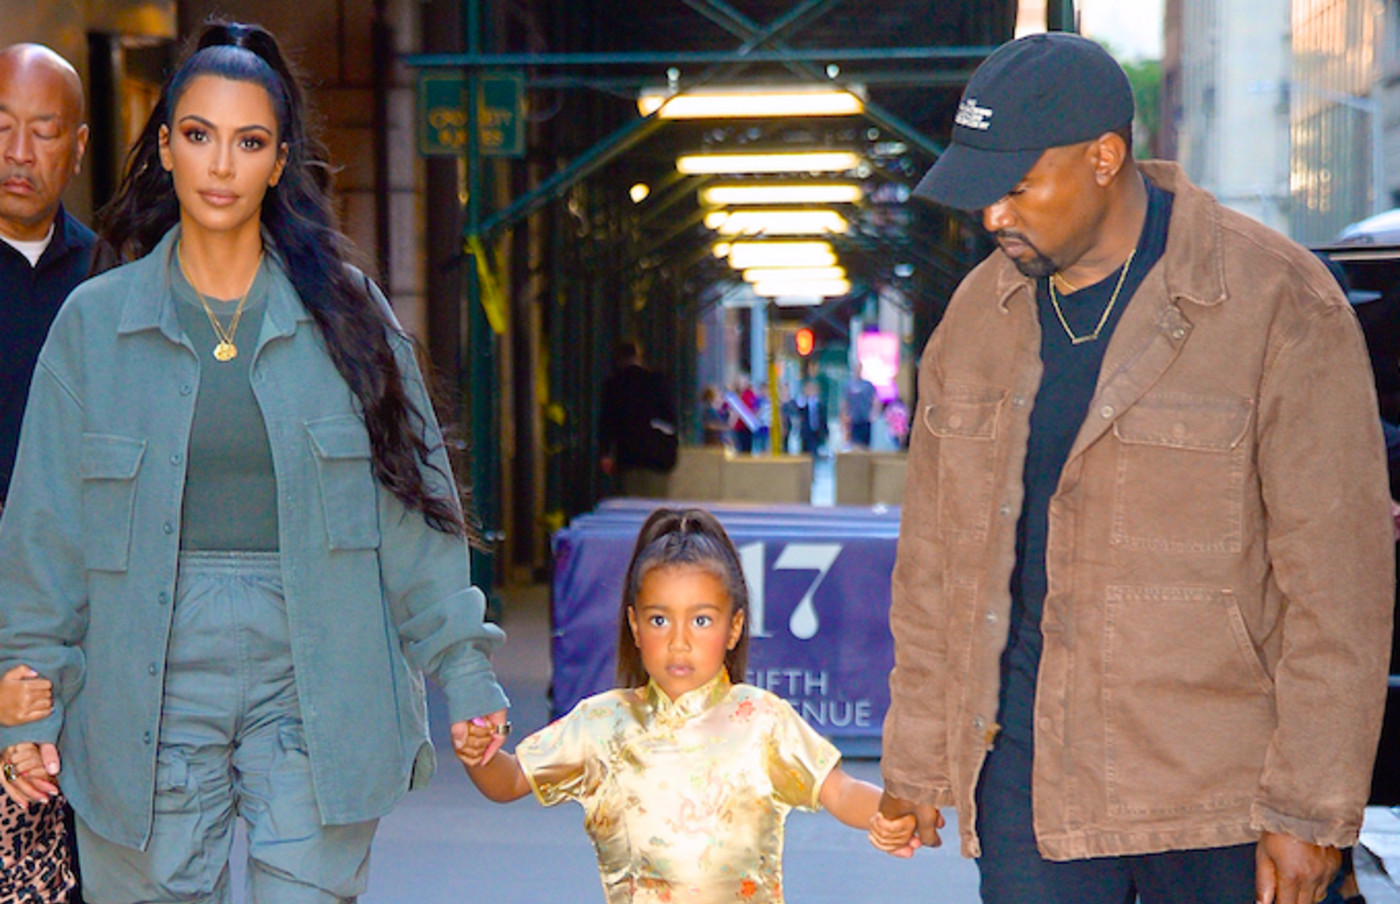 Kim Kardashian, Kanye West, and North